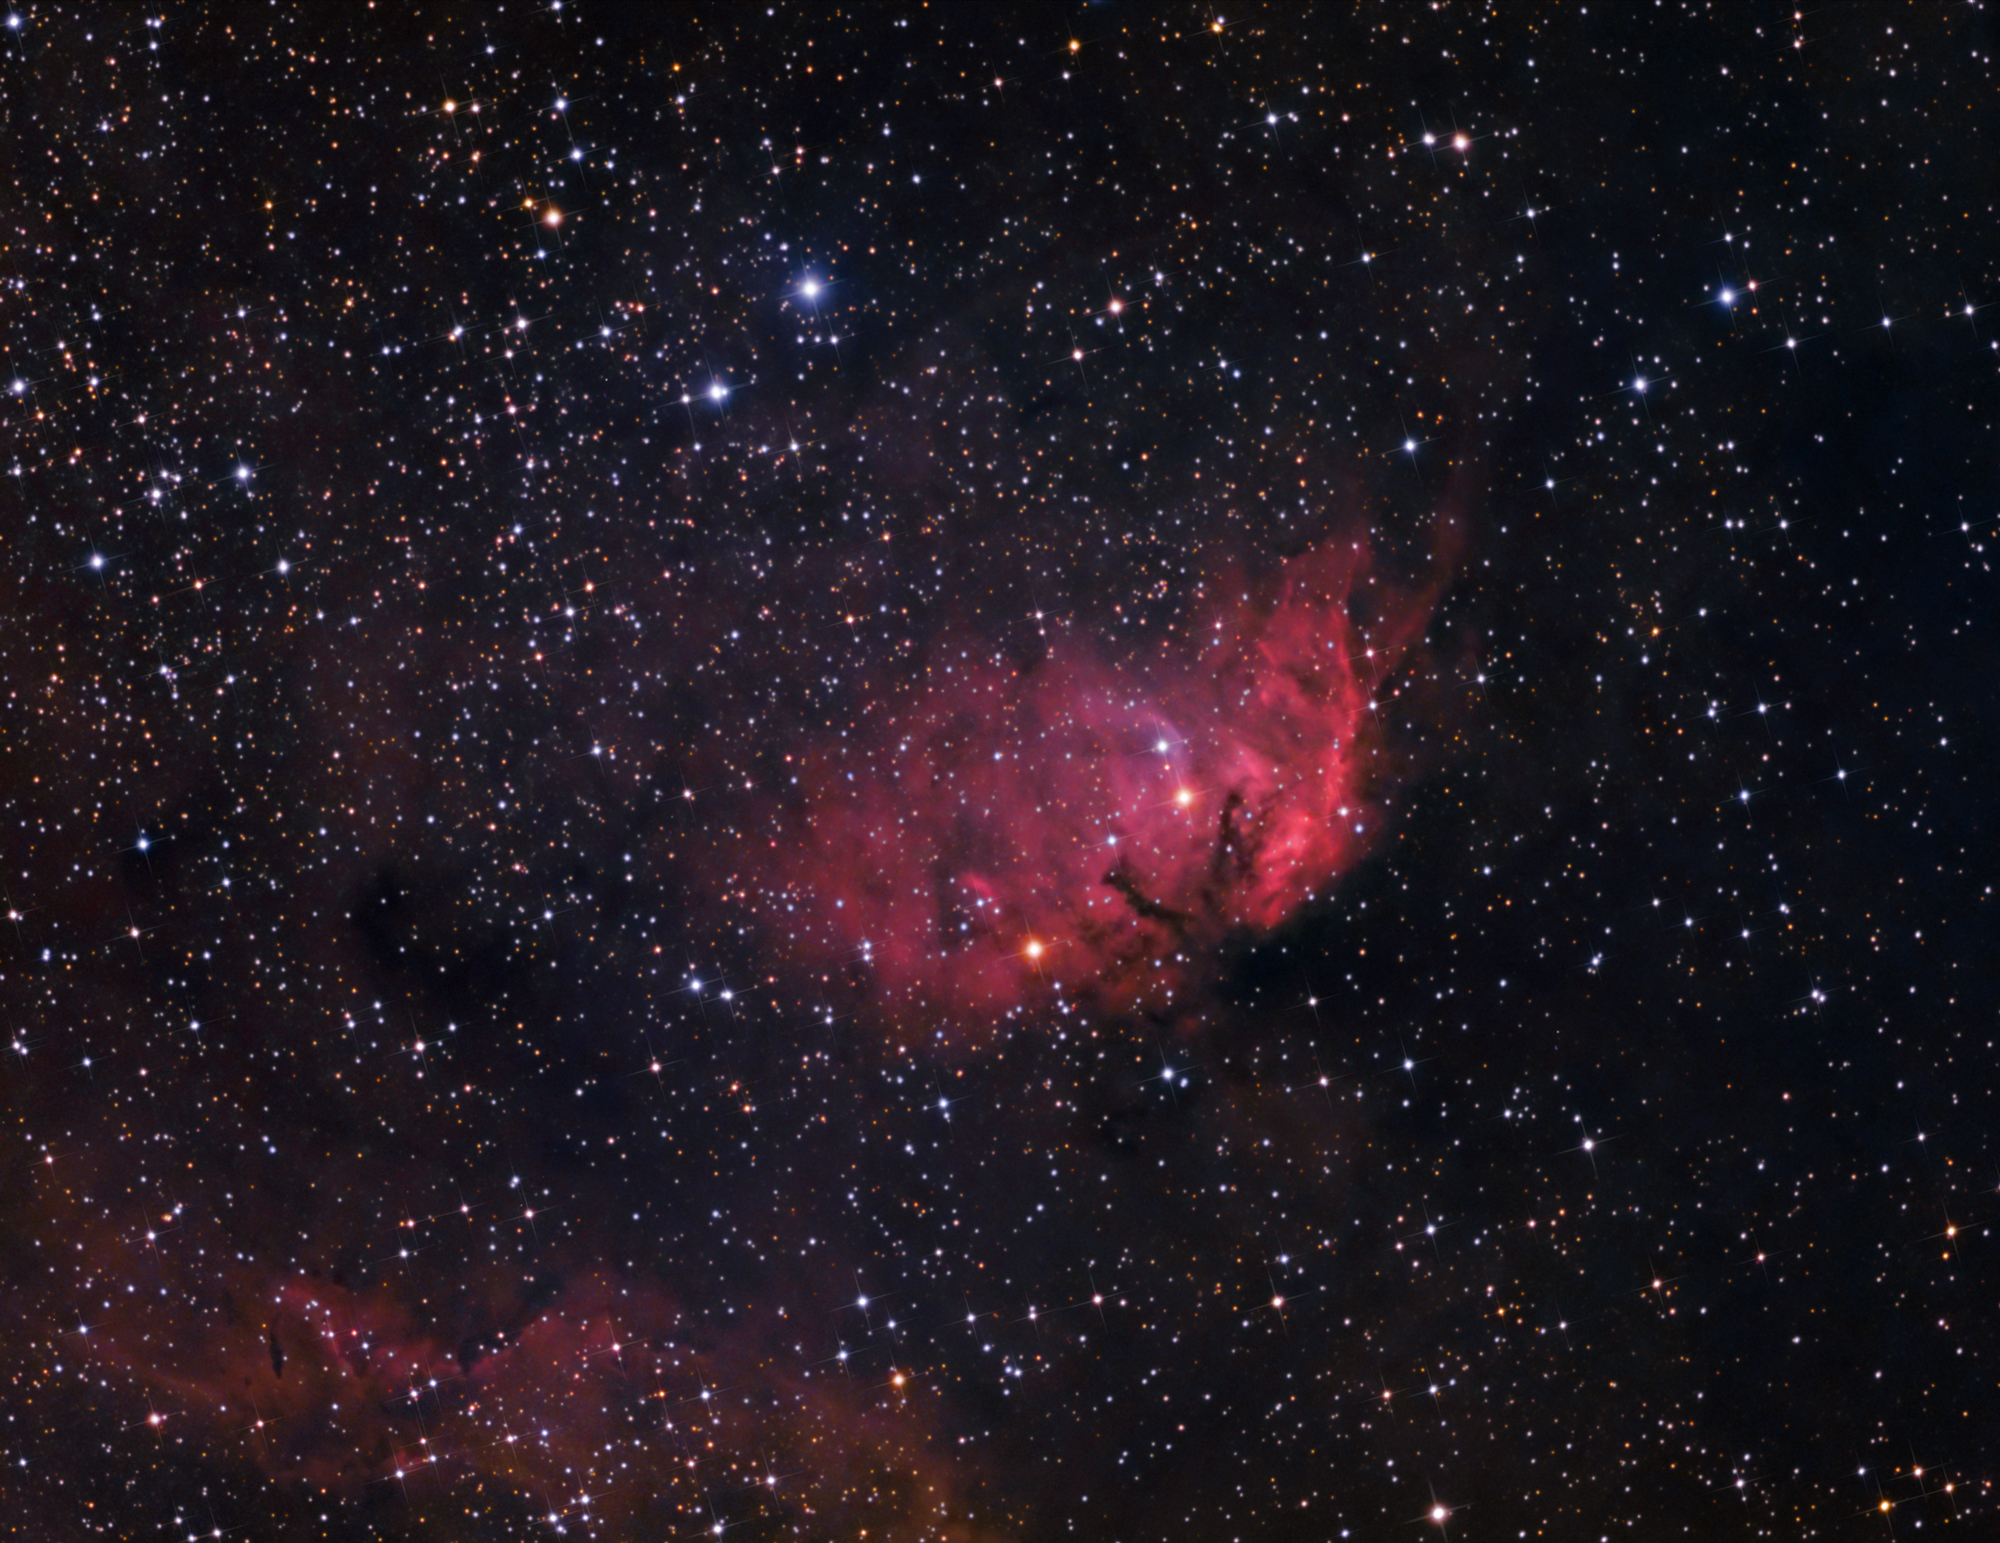 Black Hole Cygnus X-1 (page 3) - Pics about space